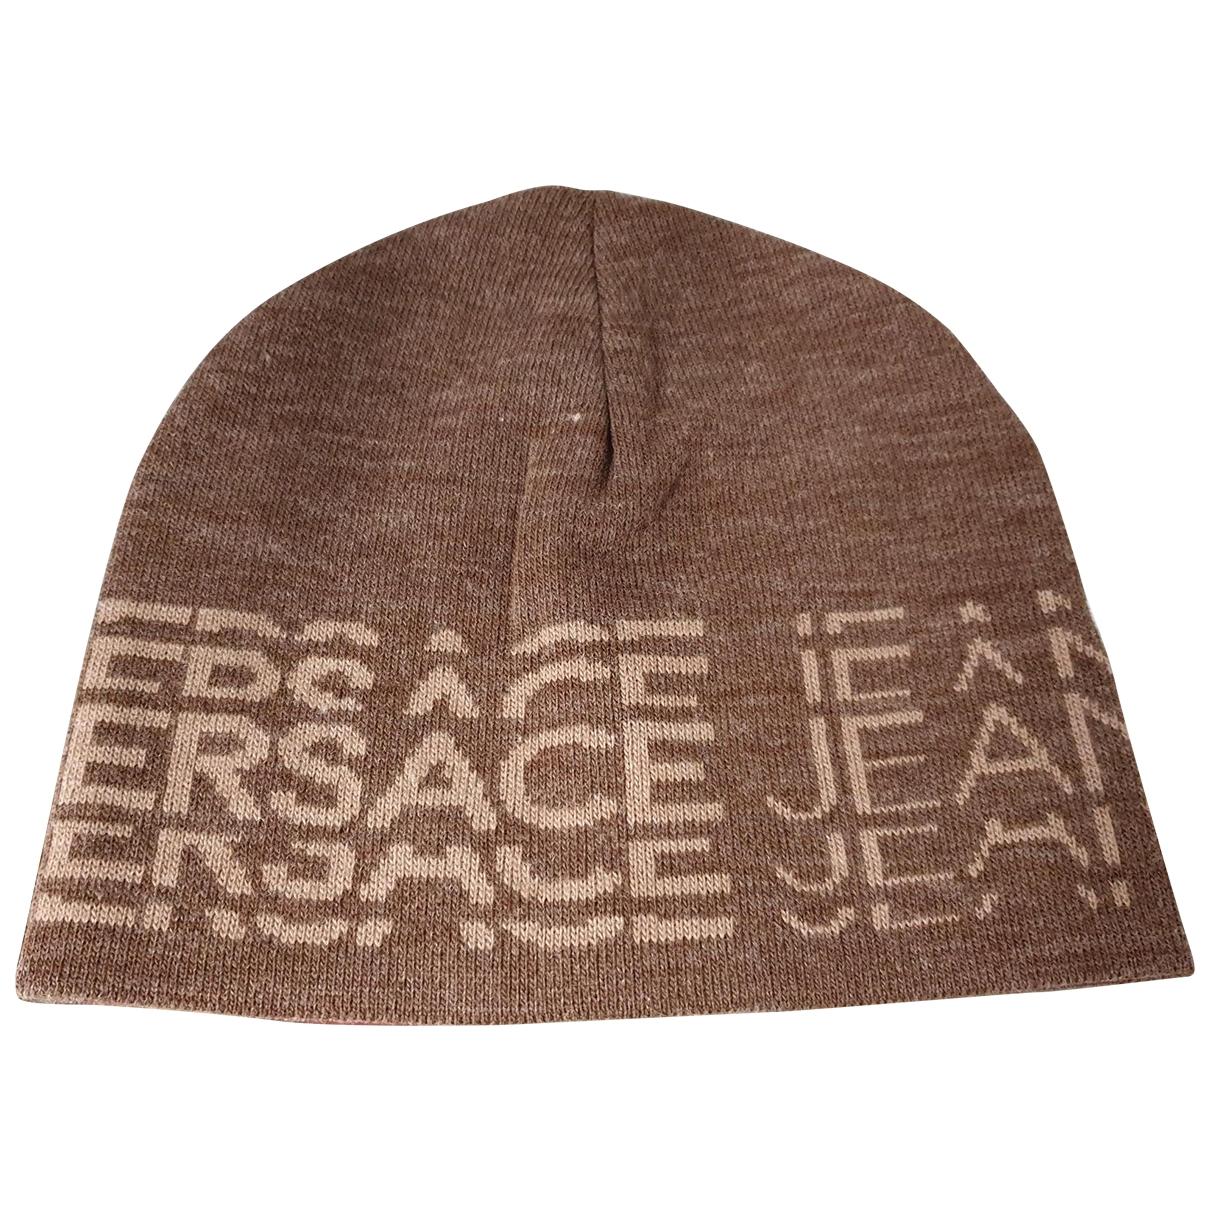 Sombrero / gorro de Lana Versace Jeans